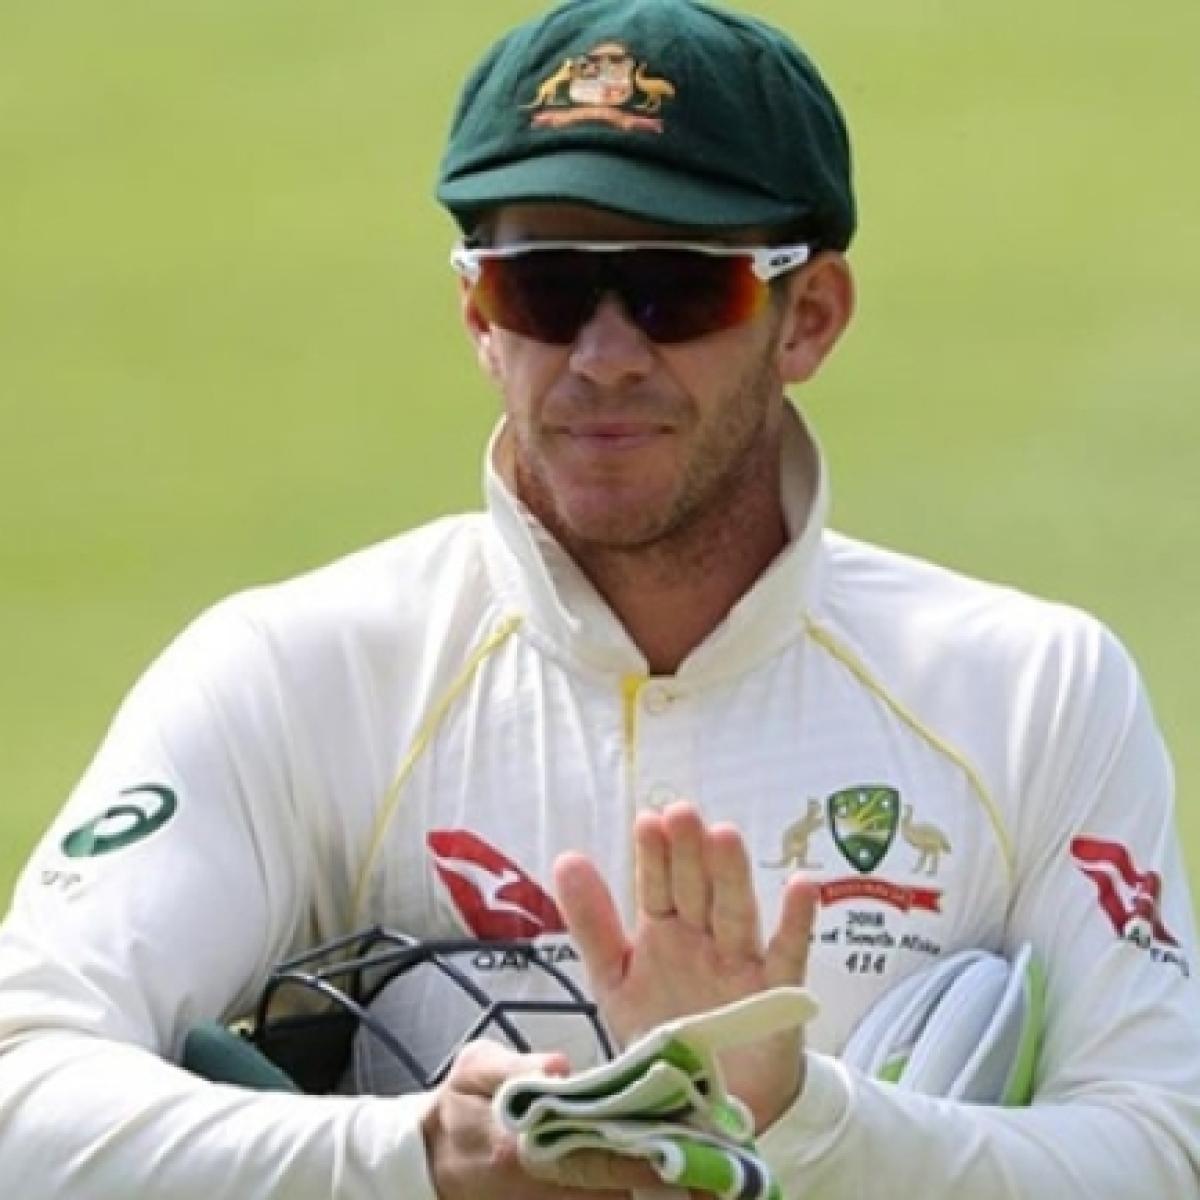 Ashes 2019 1st Test: Australia skipper Tim Paine confident of spirited performance against England